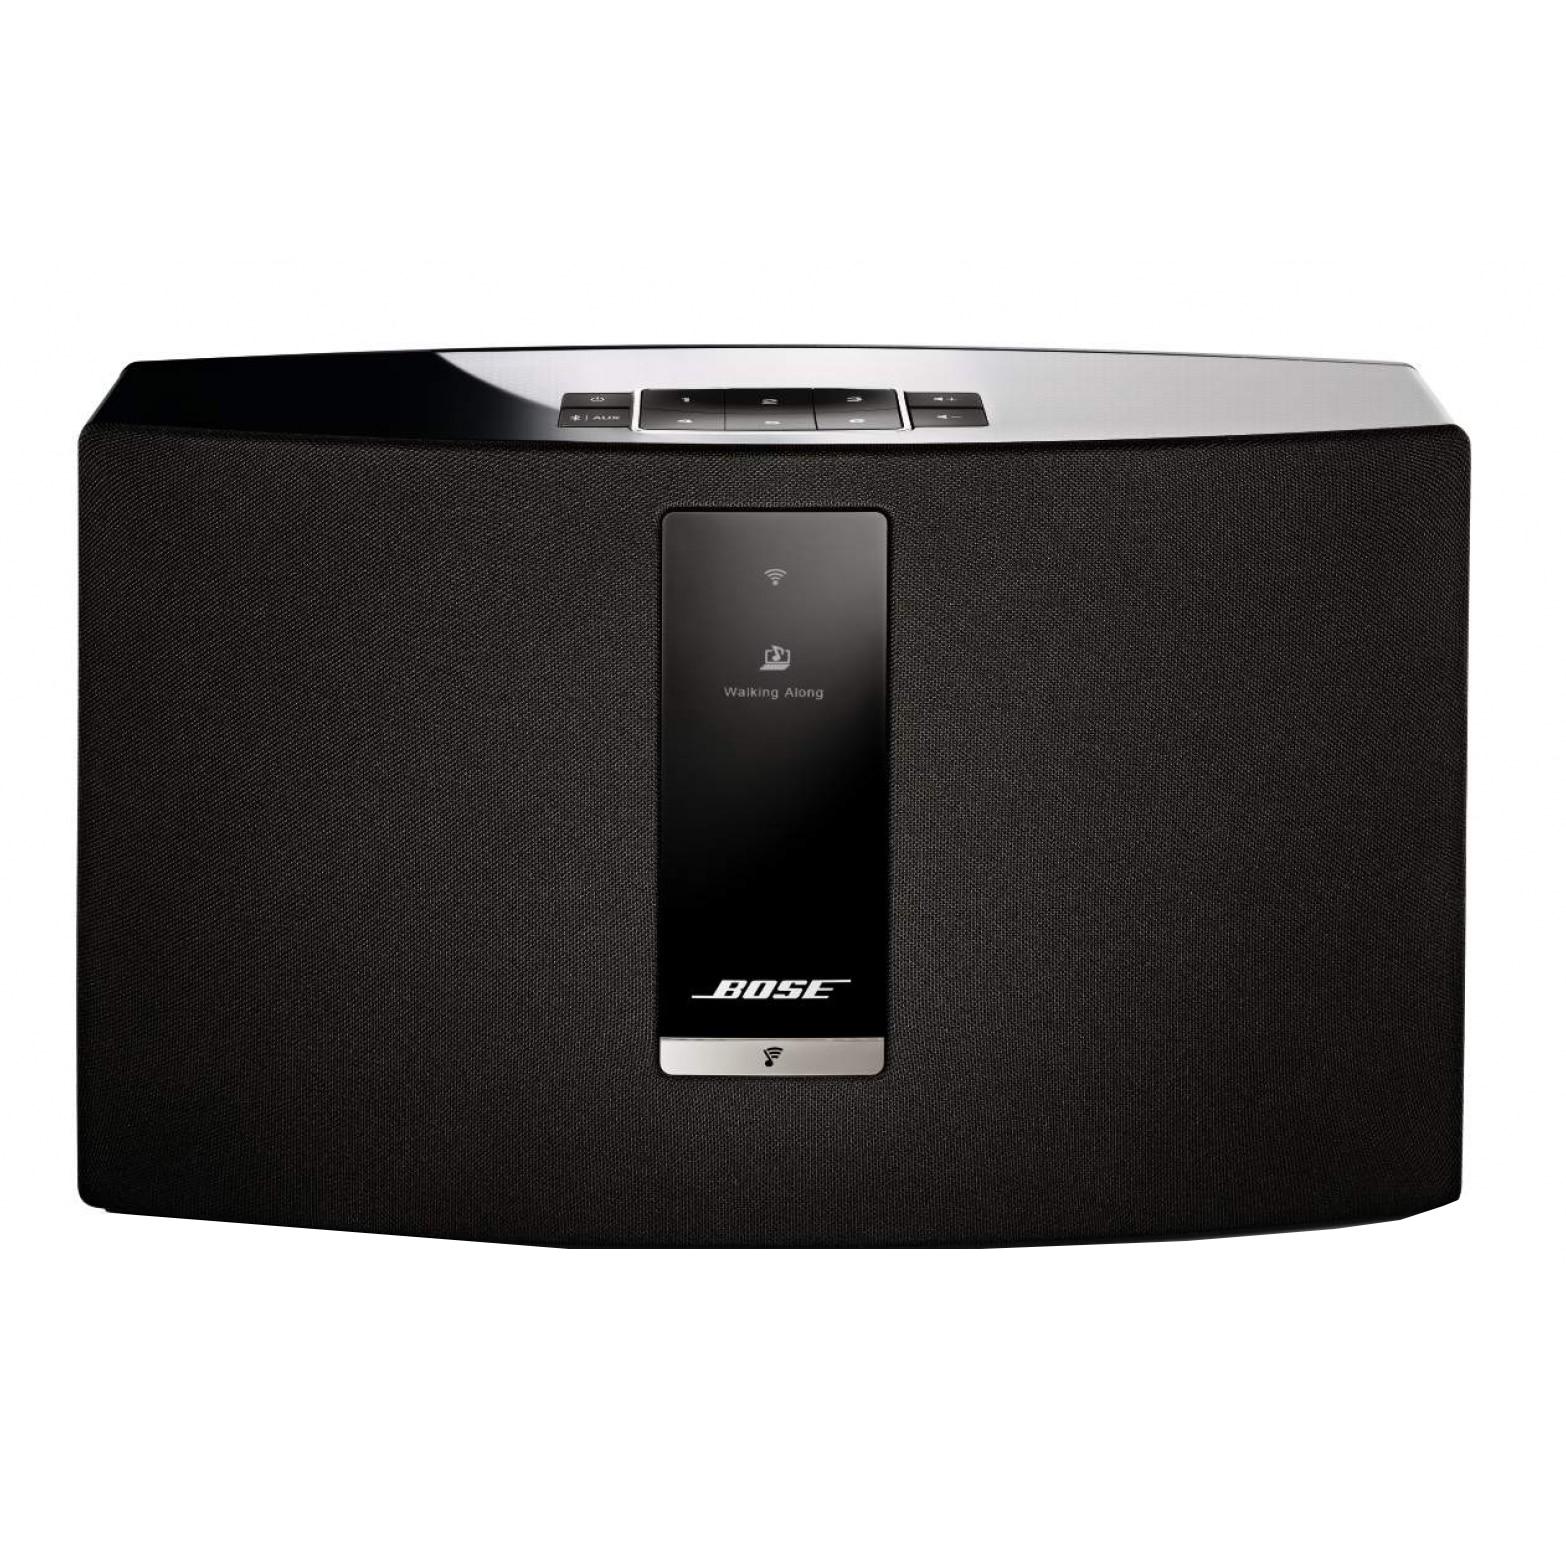 Fotografie Boxa WiFi Bluetooth Bose SoundTouch 20 III, Negru